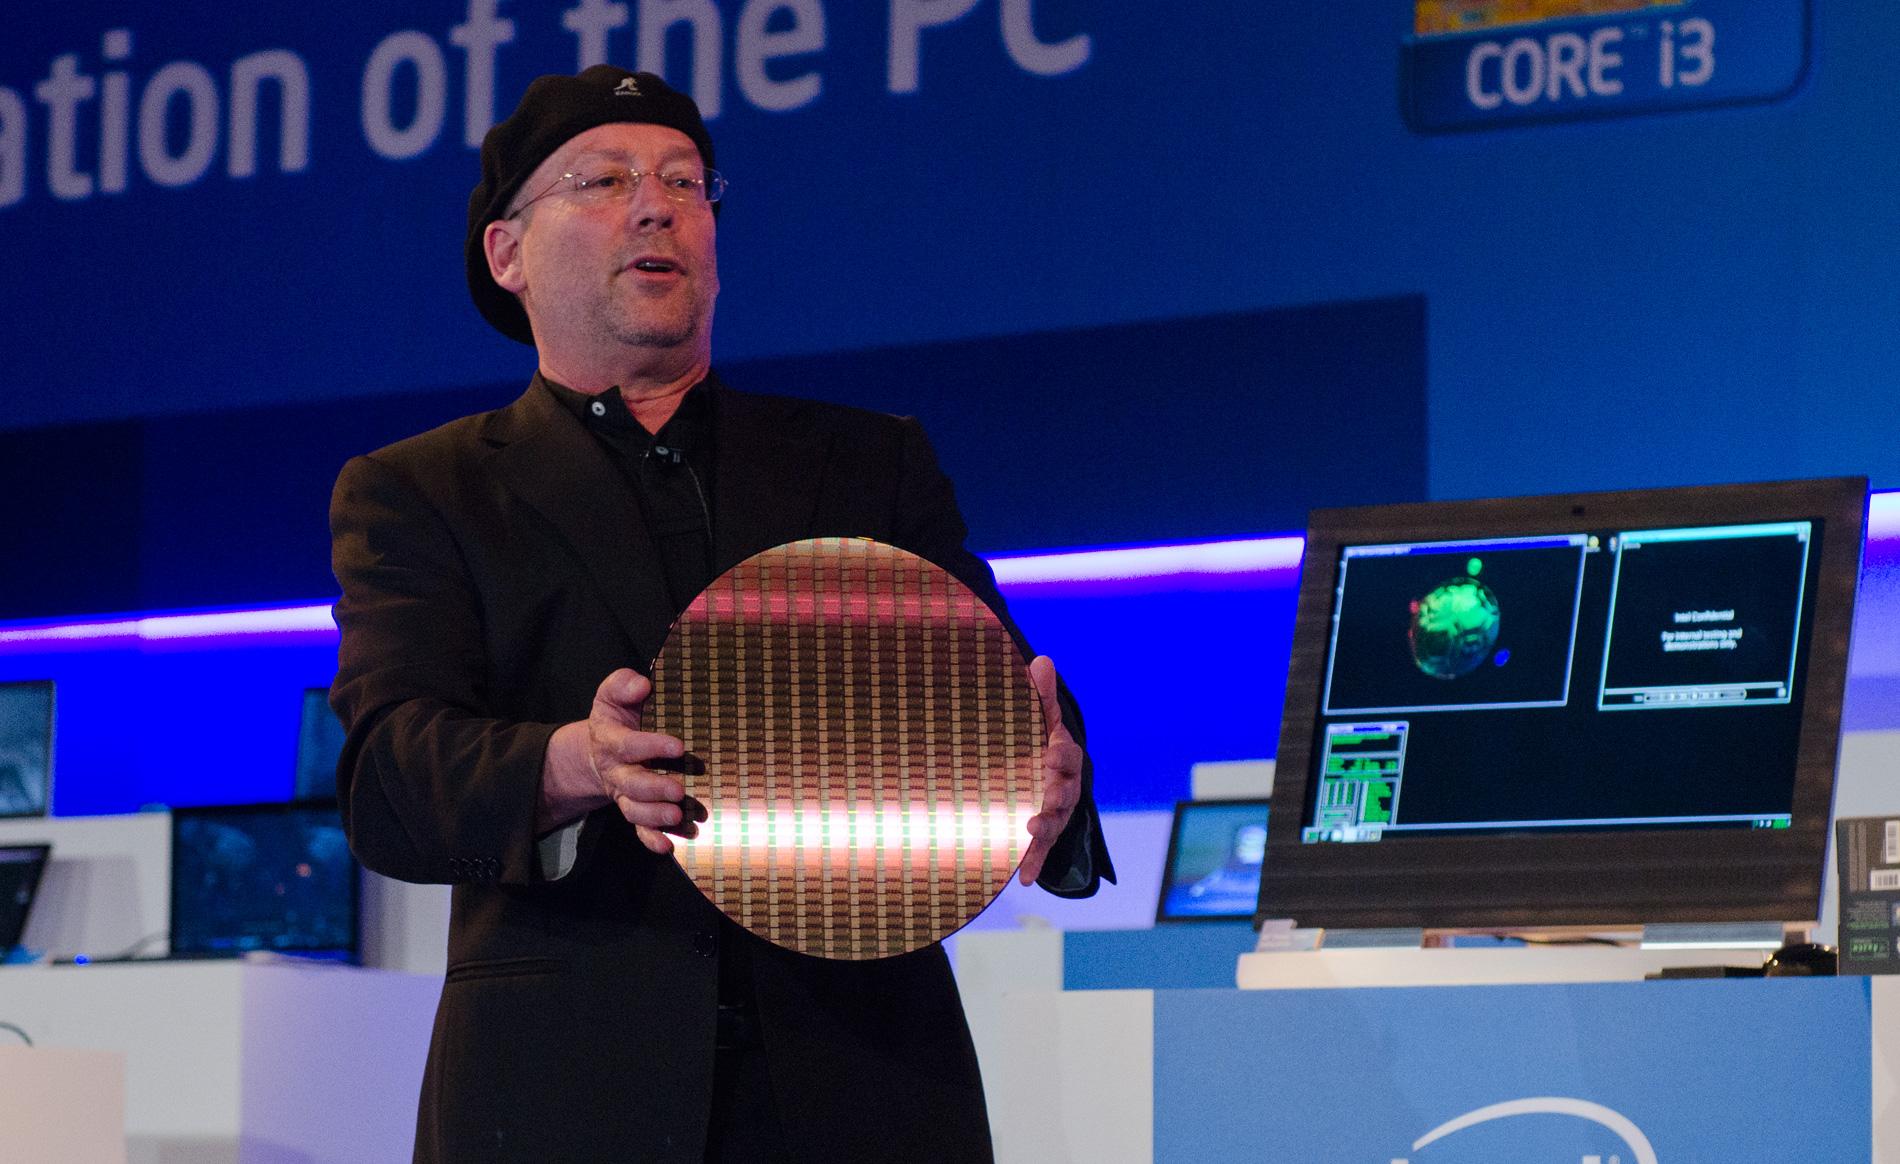 Intel 22nm wafer